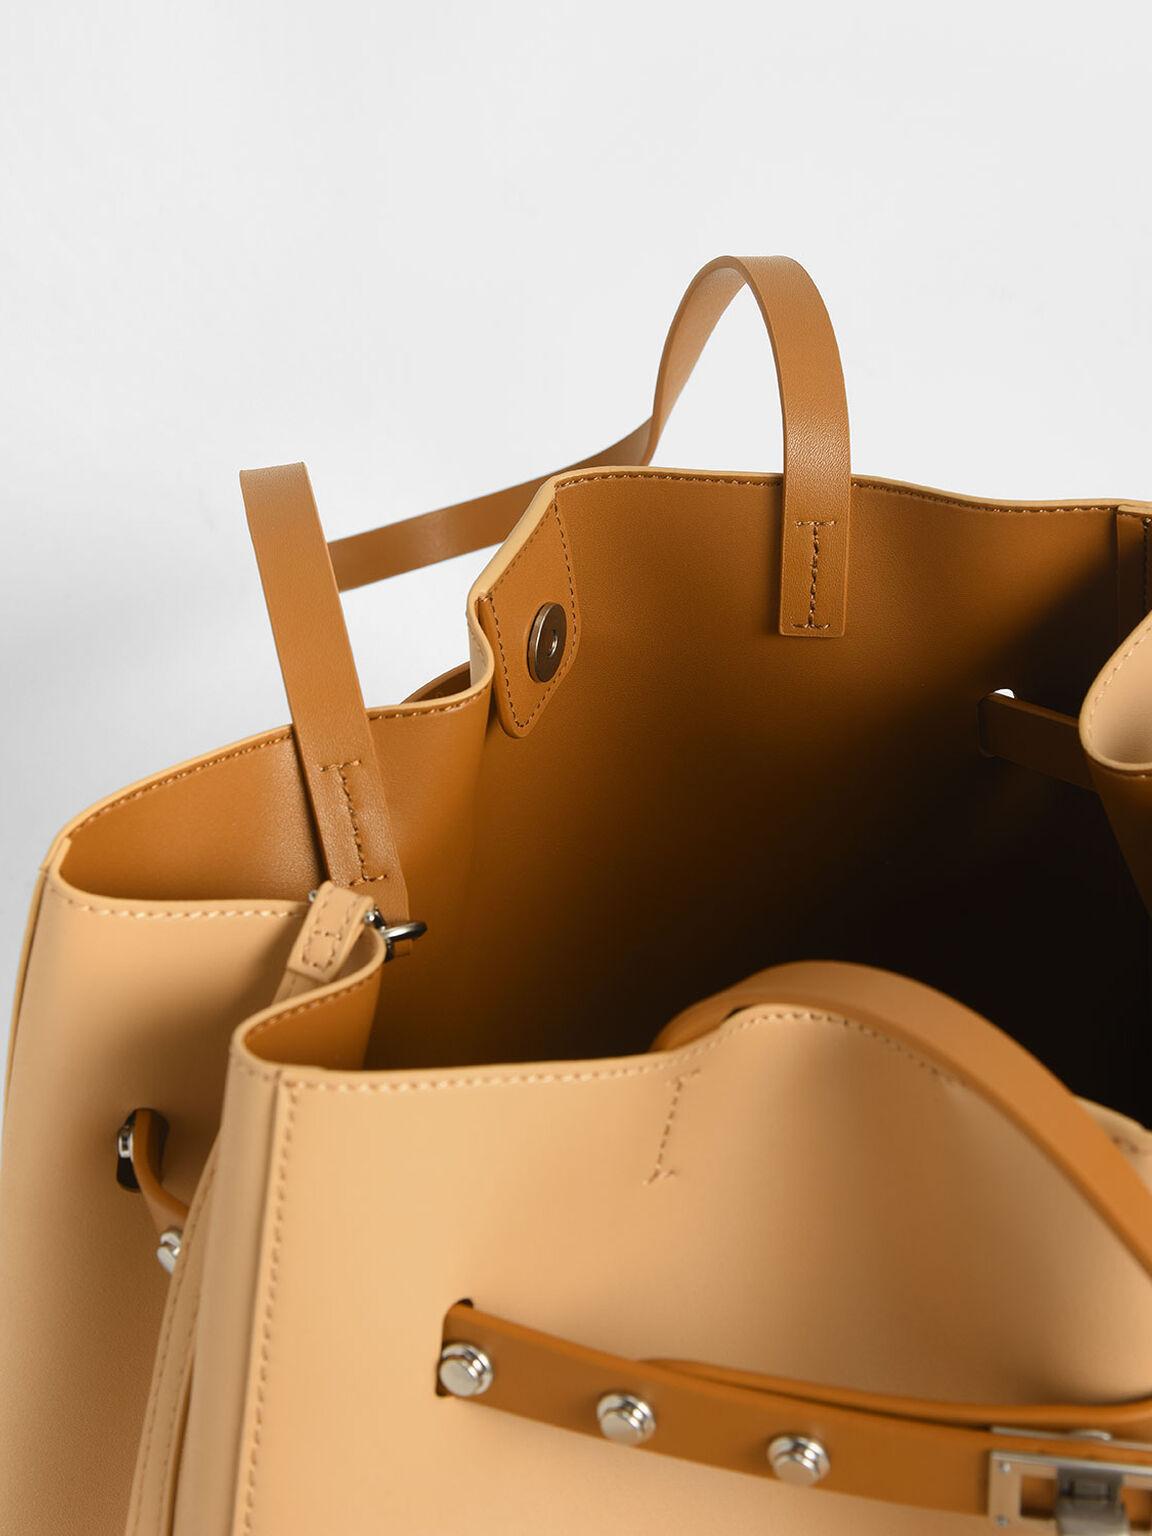 Grommet Strap Tote Bag, Nude, hi-res